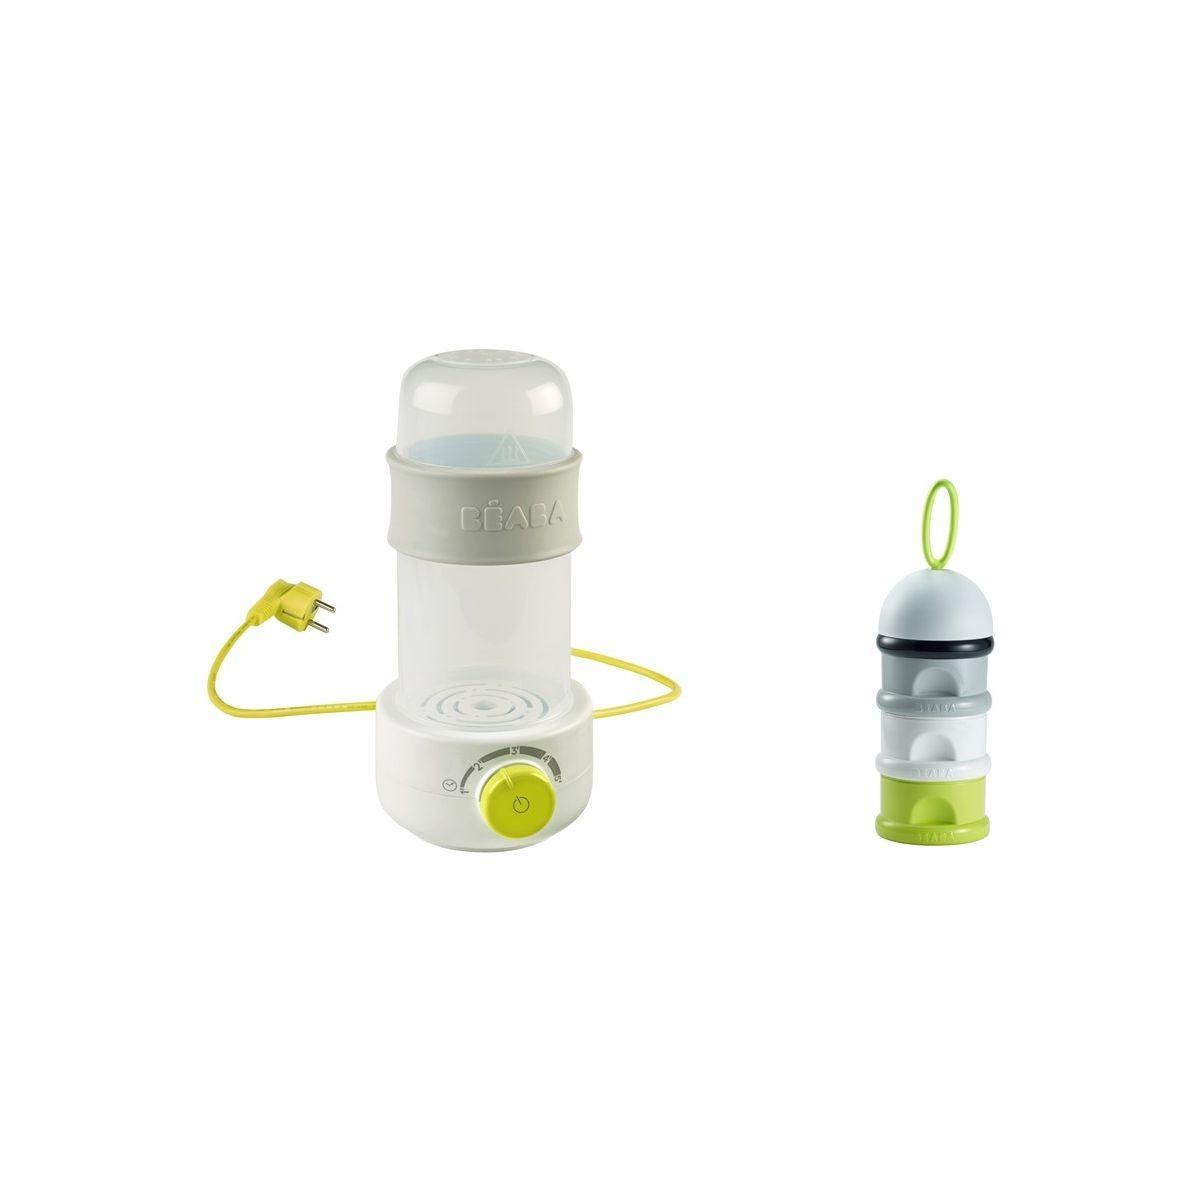 Chauffe biberon beaba 911661 babymilk + boite doseuse n�on - livraison offerte : code livdom (photo)